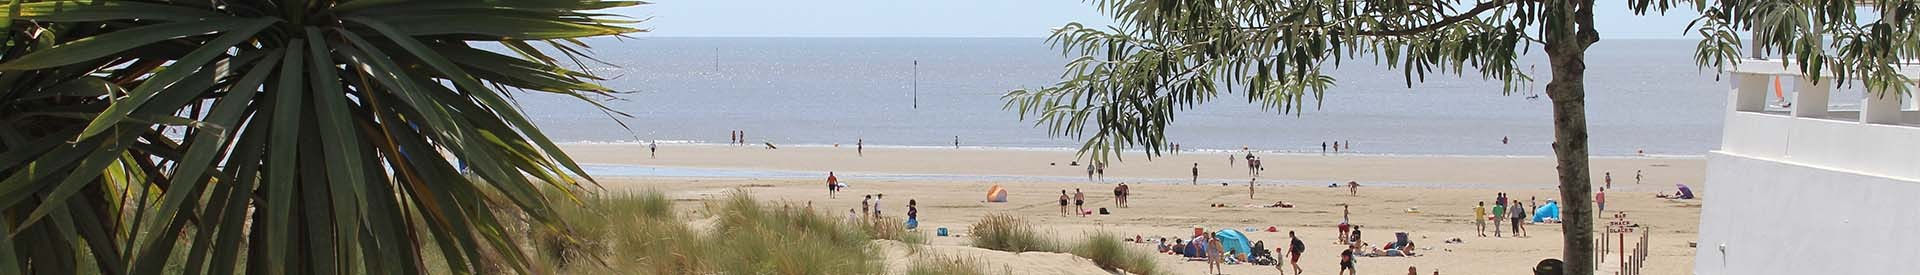 poste-secours-plage-ocean-st-brevin-117